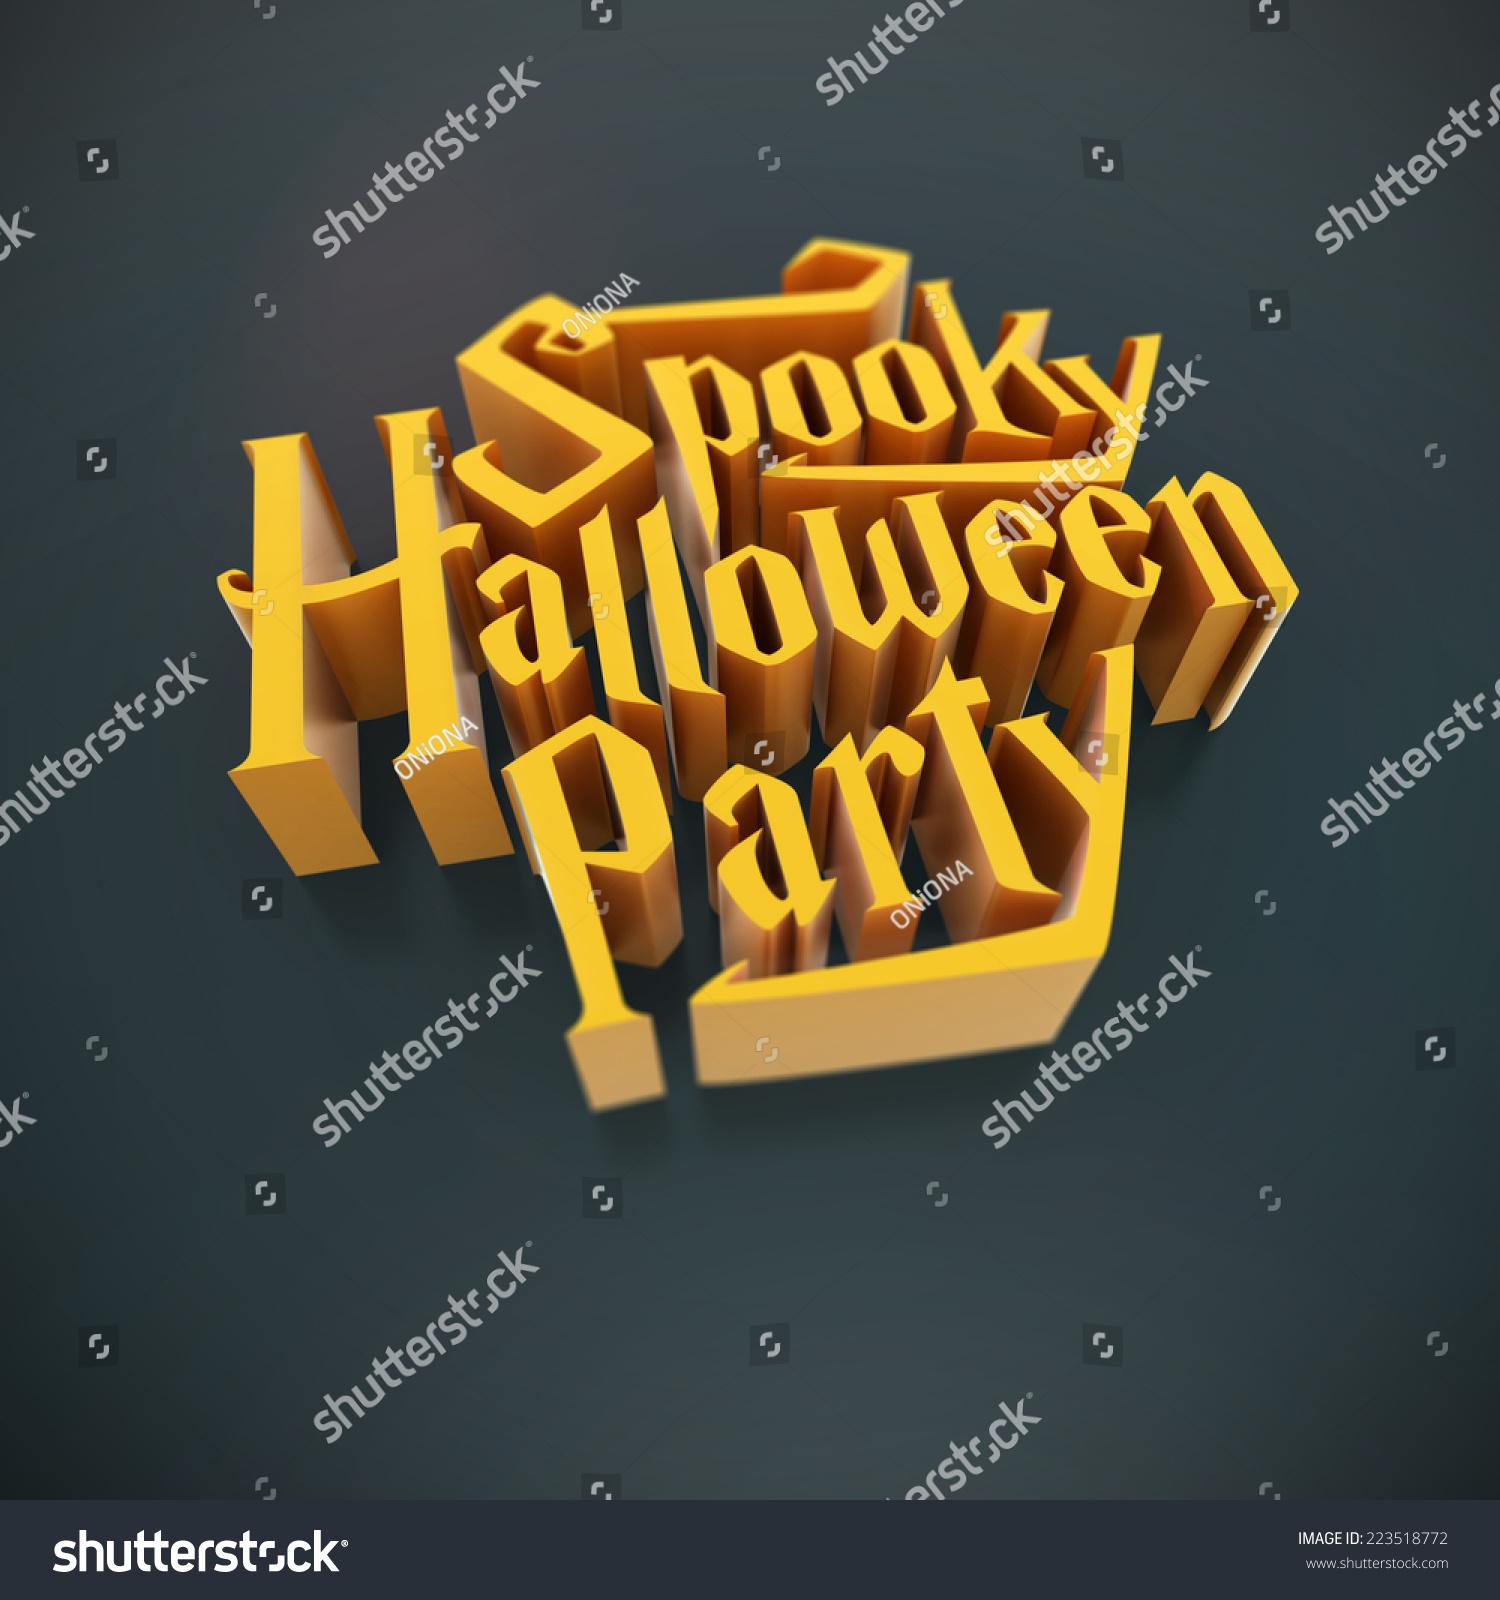 spooky halloween party pumpkin orange letters stock illustration